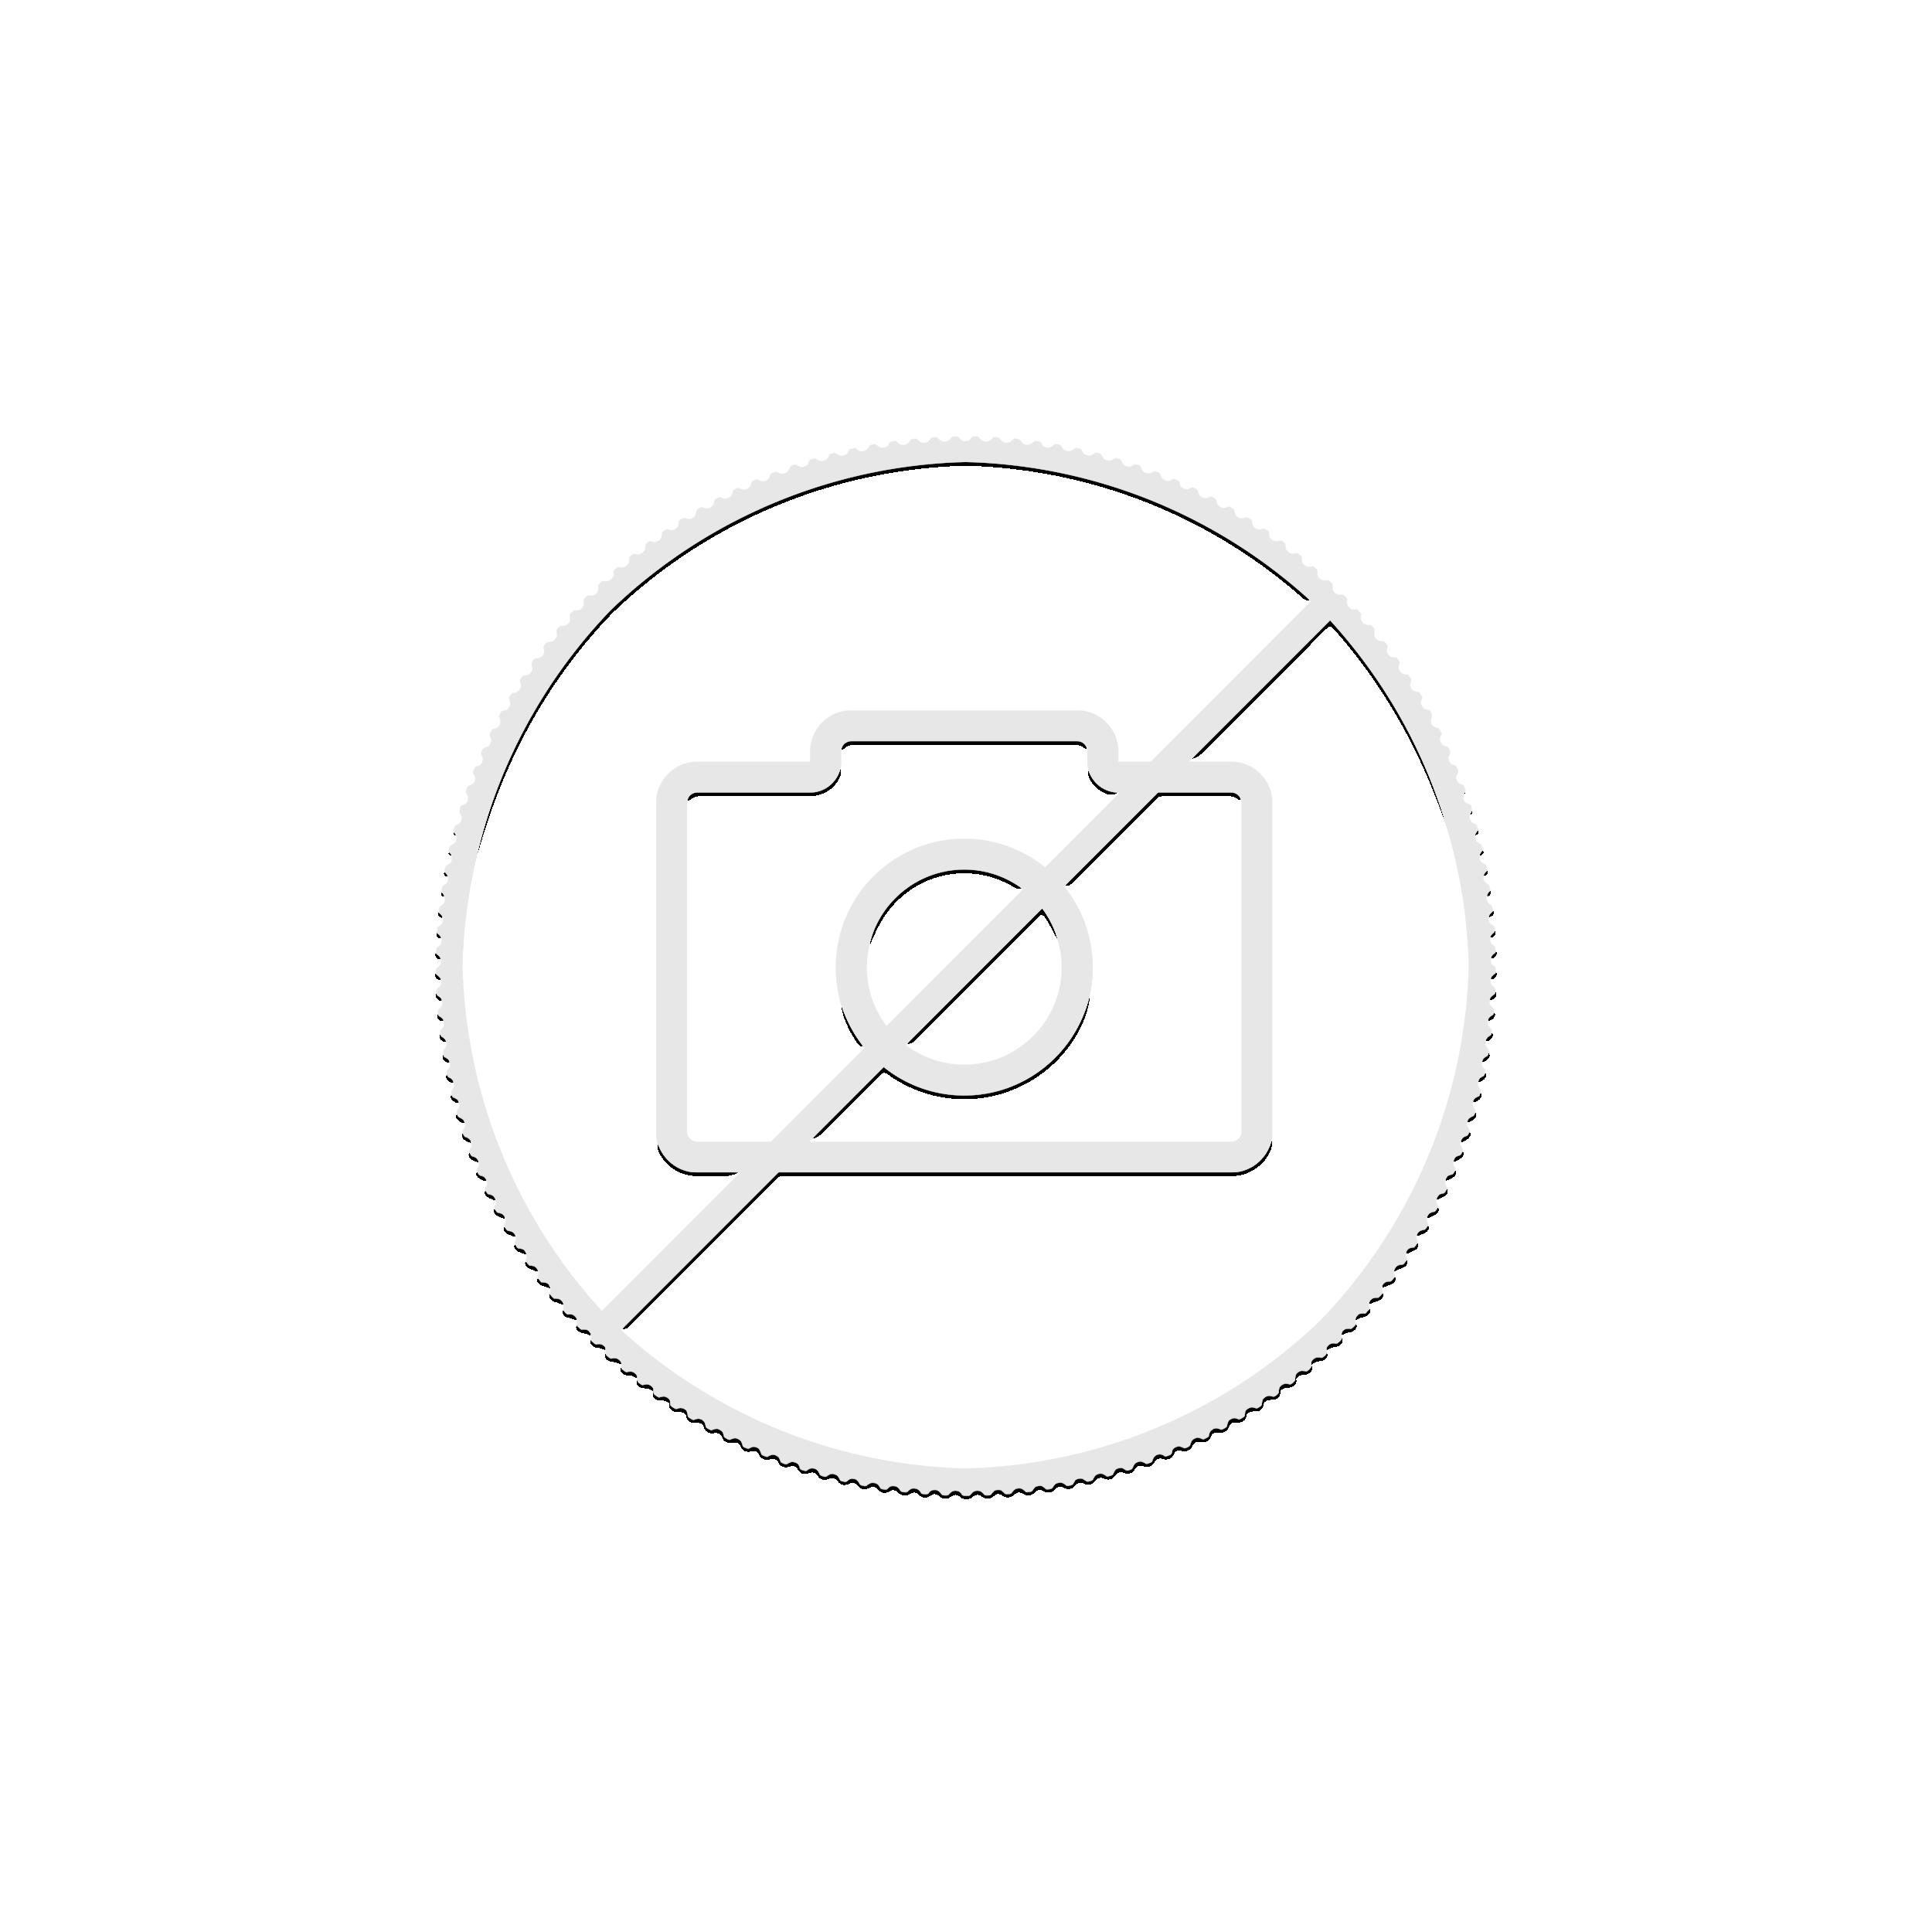 1 troy ounce silver coin Disney Mickey Mouse - Aim High 2020 Proof